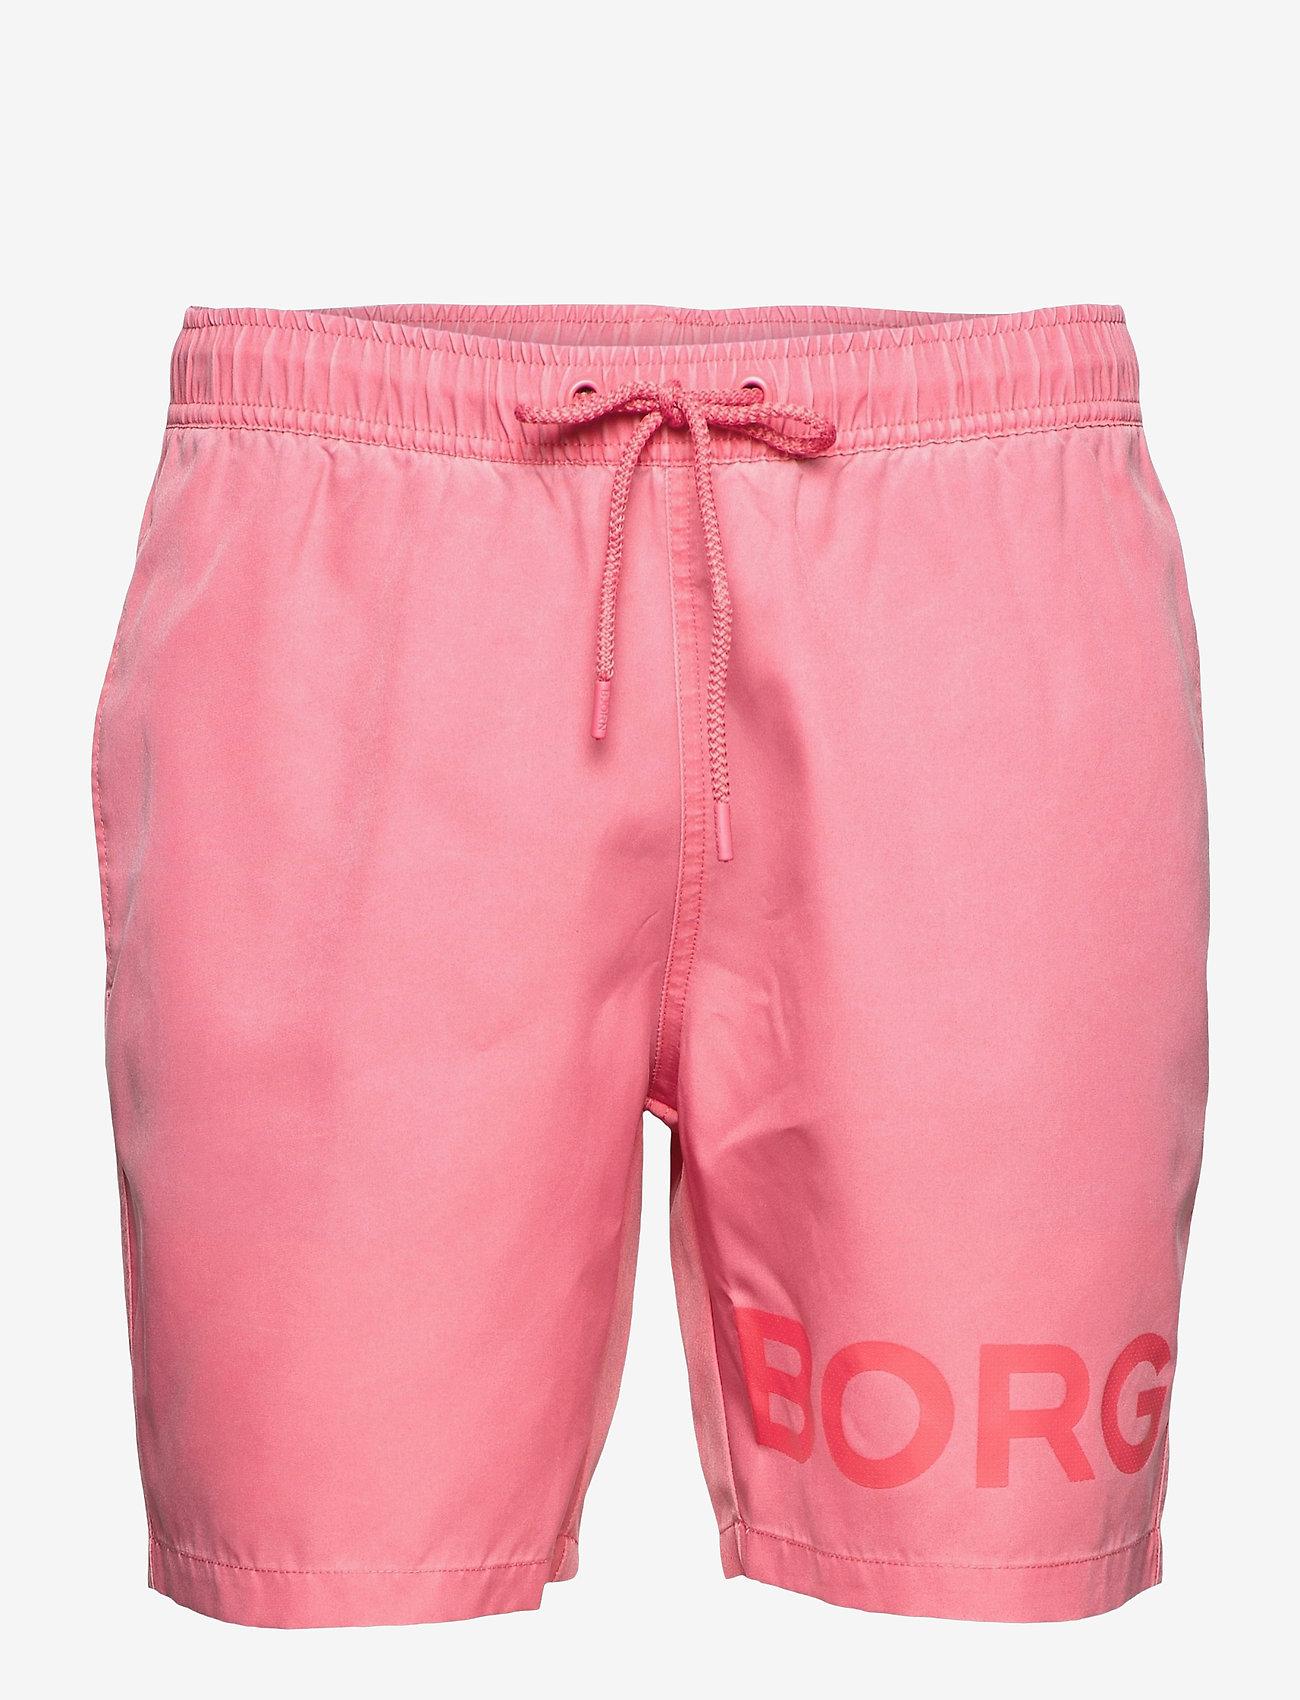 Björn Borg - SHORTS SHELDON SHELDON - shorts de bain - sunkist coral - 1